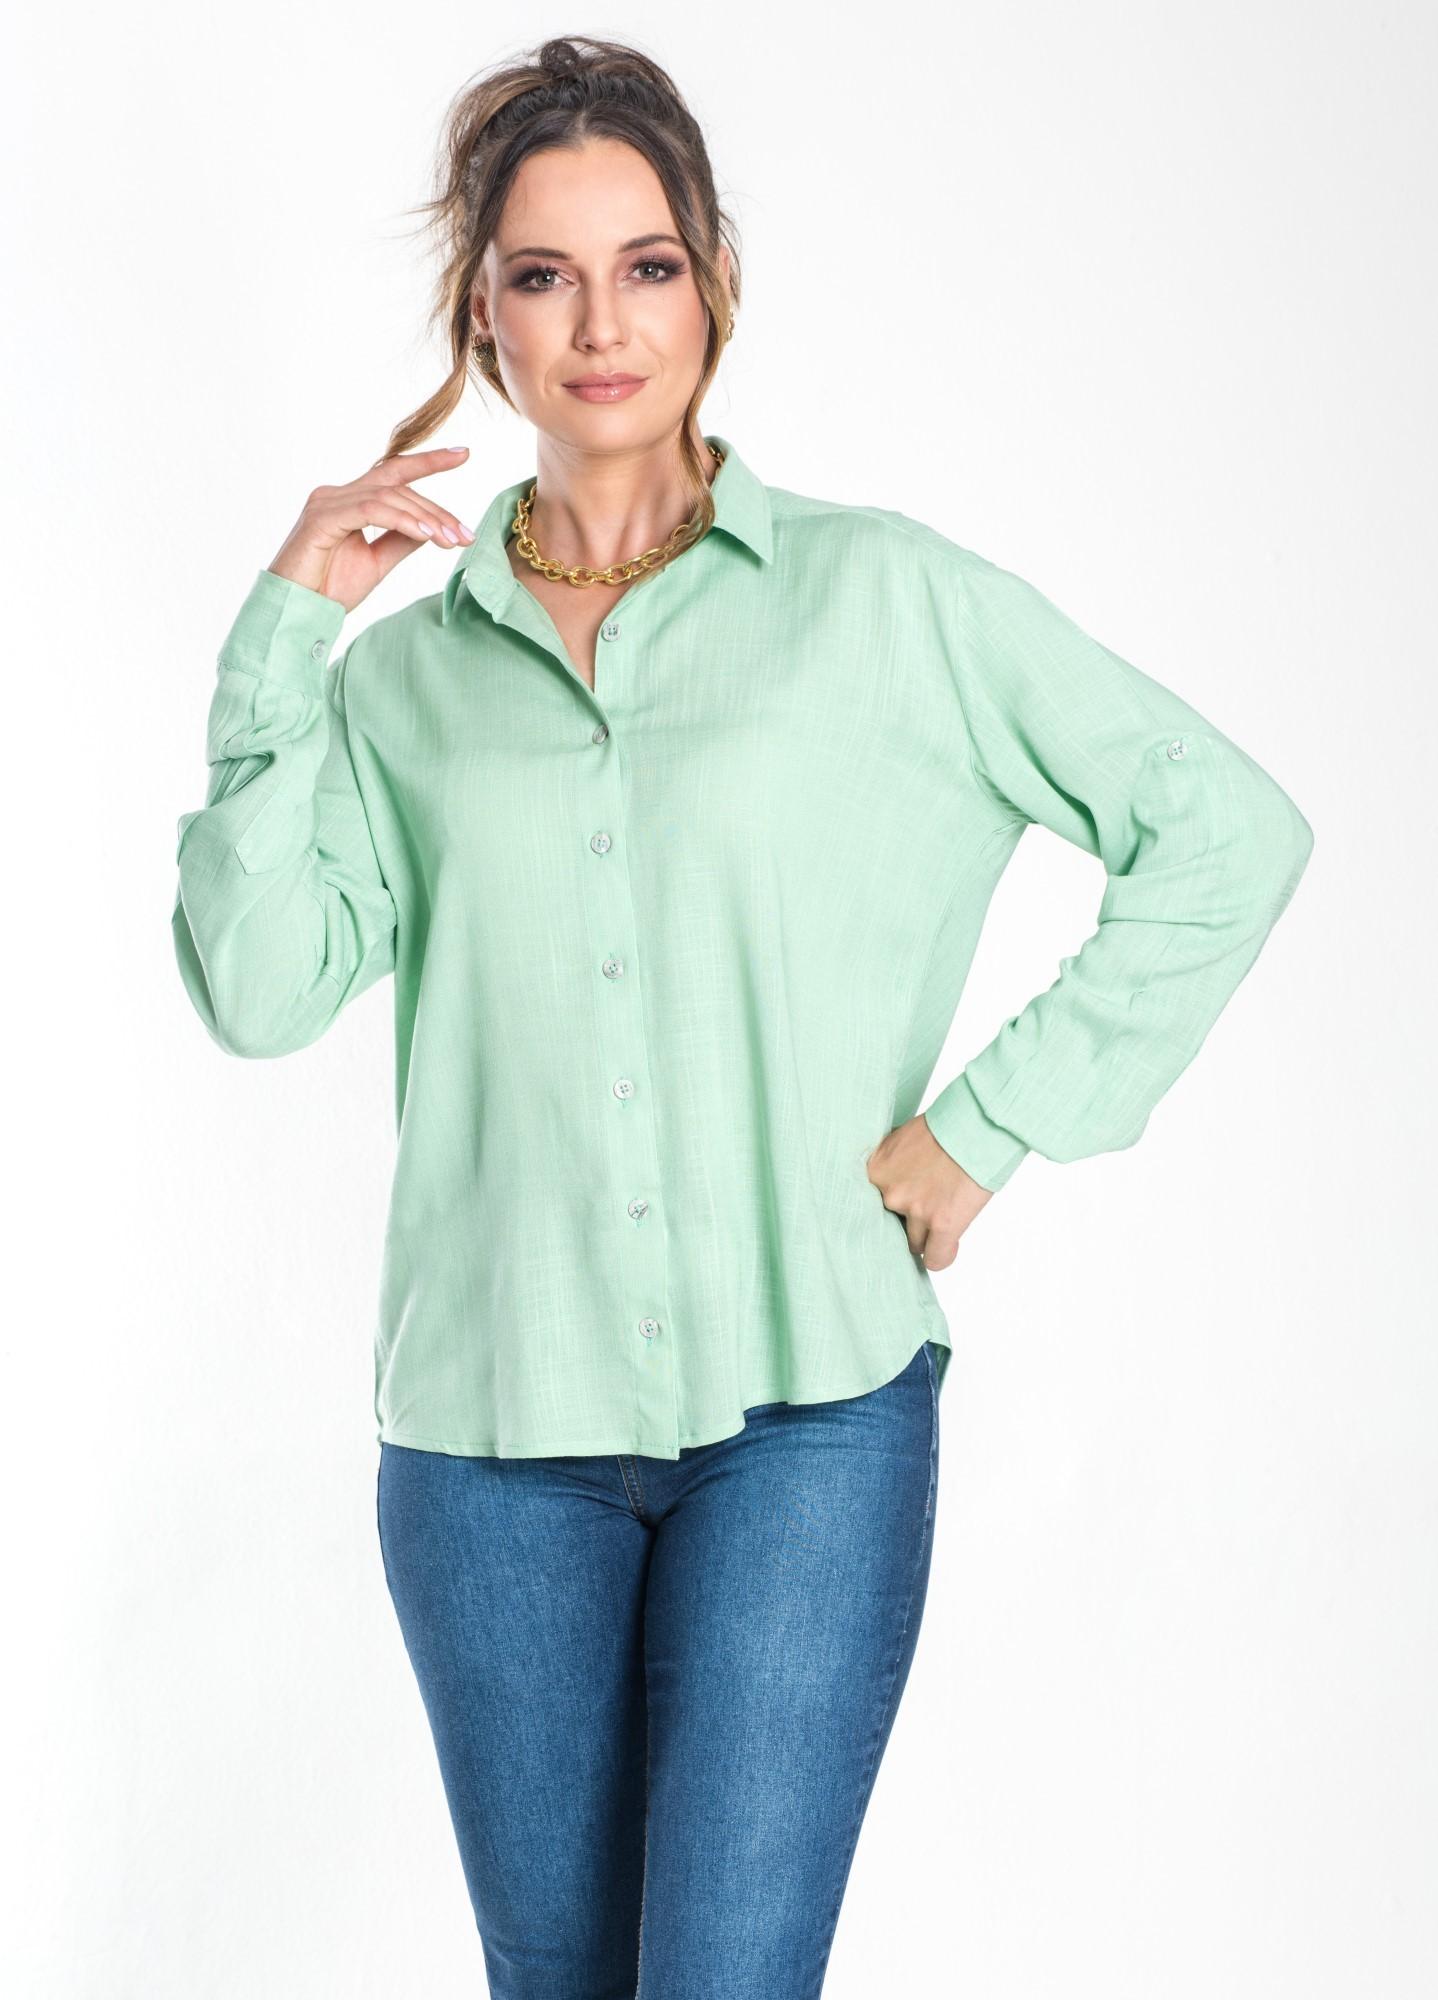 Camisa Feminina Linho Menta